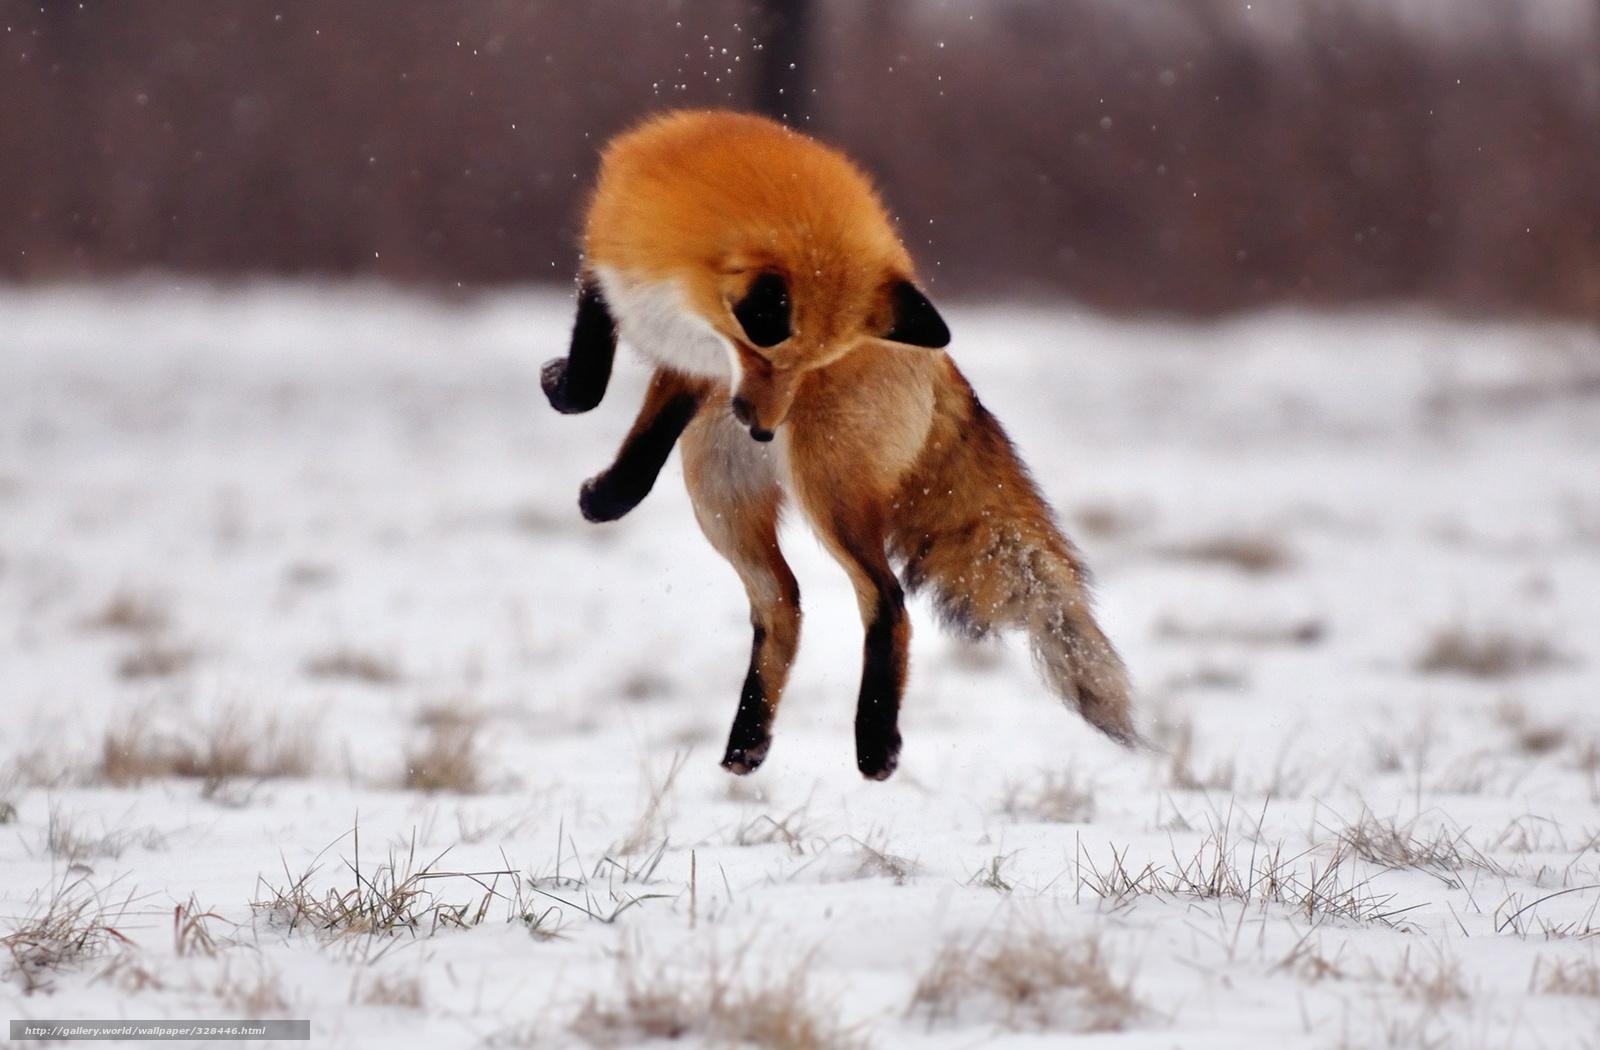 Tlcharger fond d 39 ecran renard sauter hiver champ fonds for Fond ecran hiver animaux